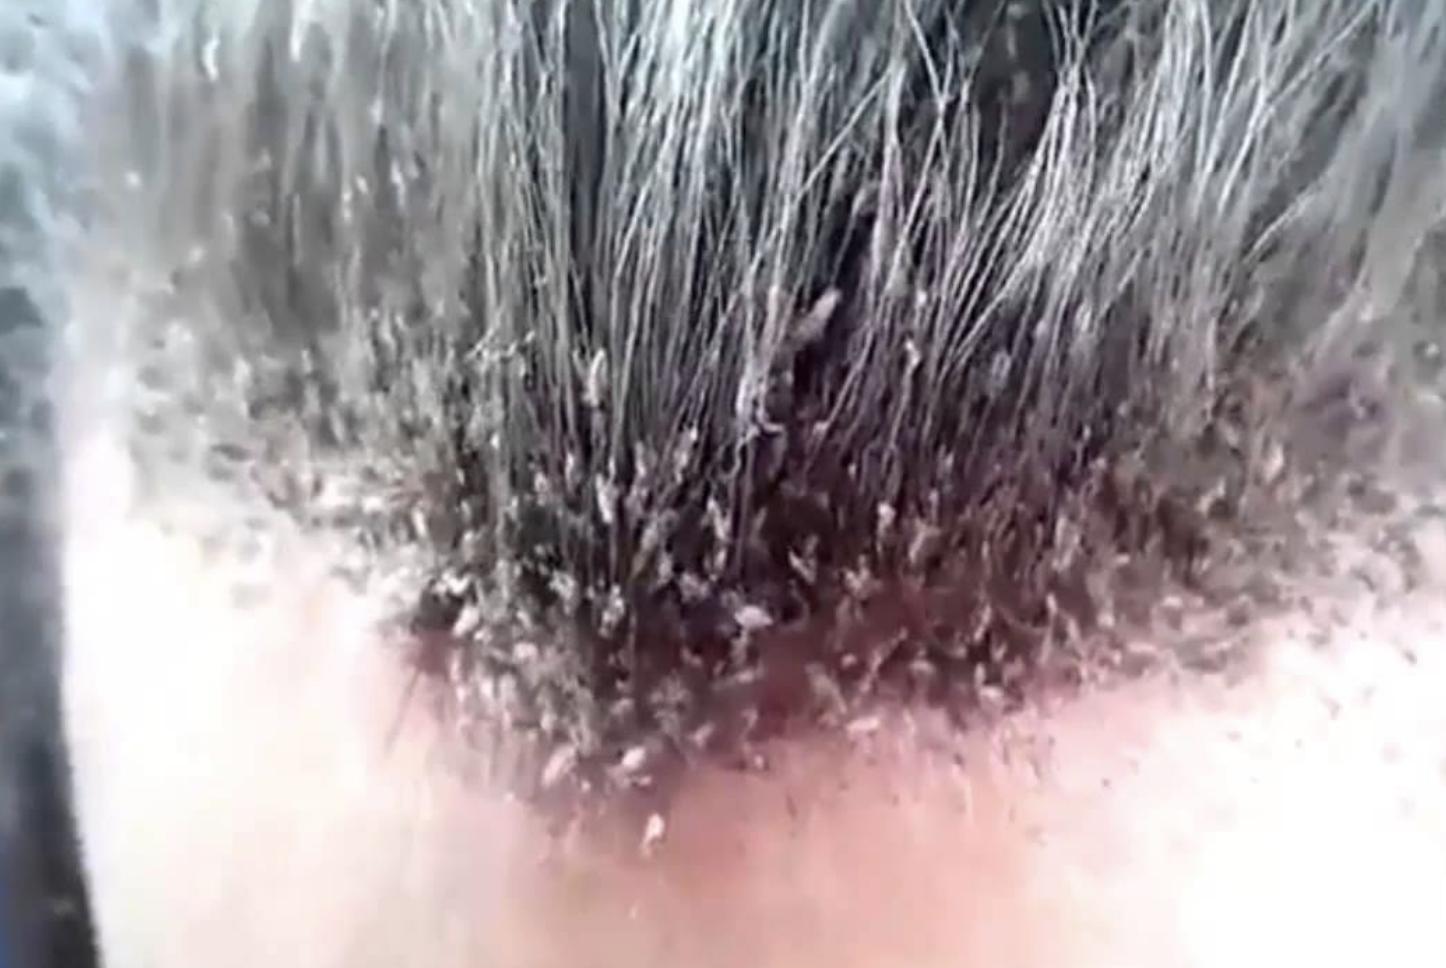 11 Horrific Hairdressing Nightmares